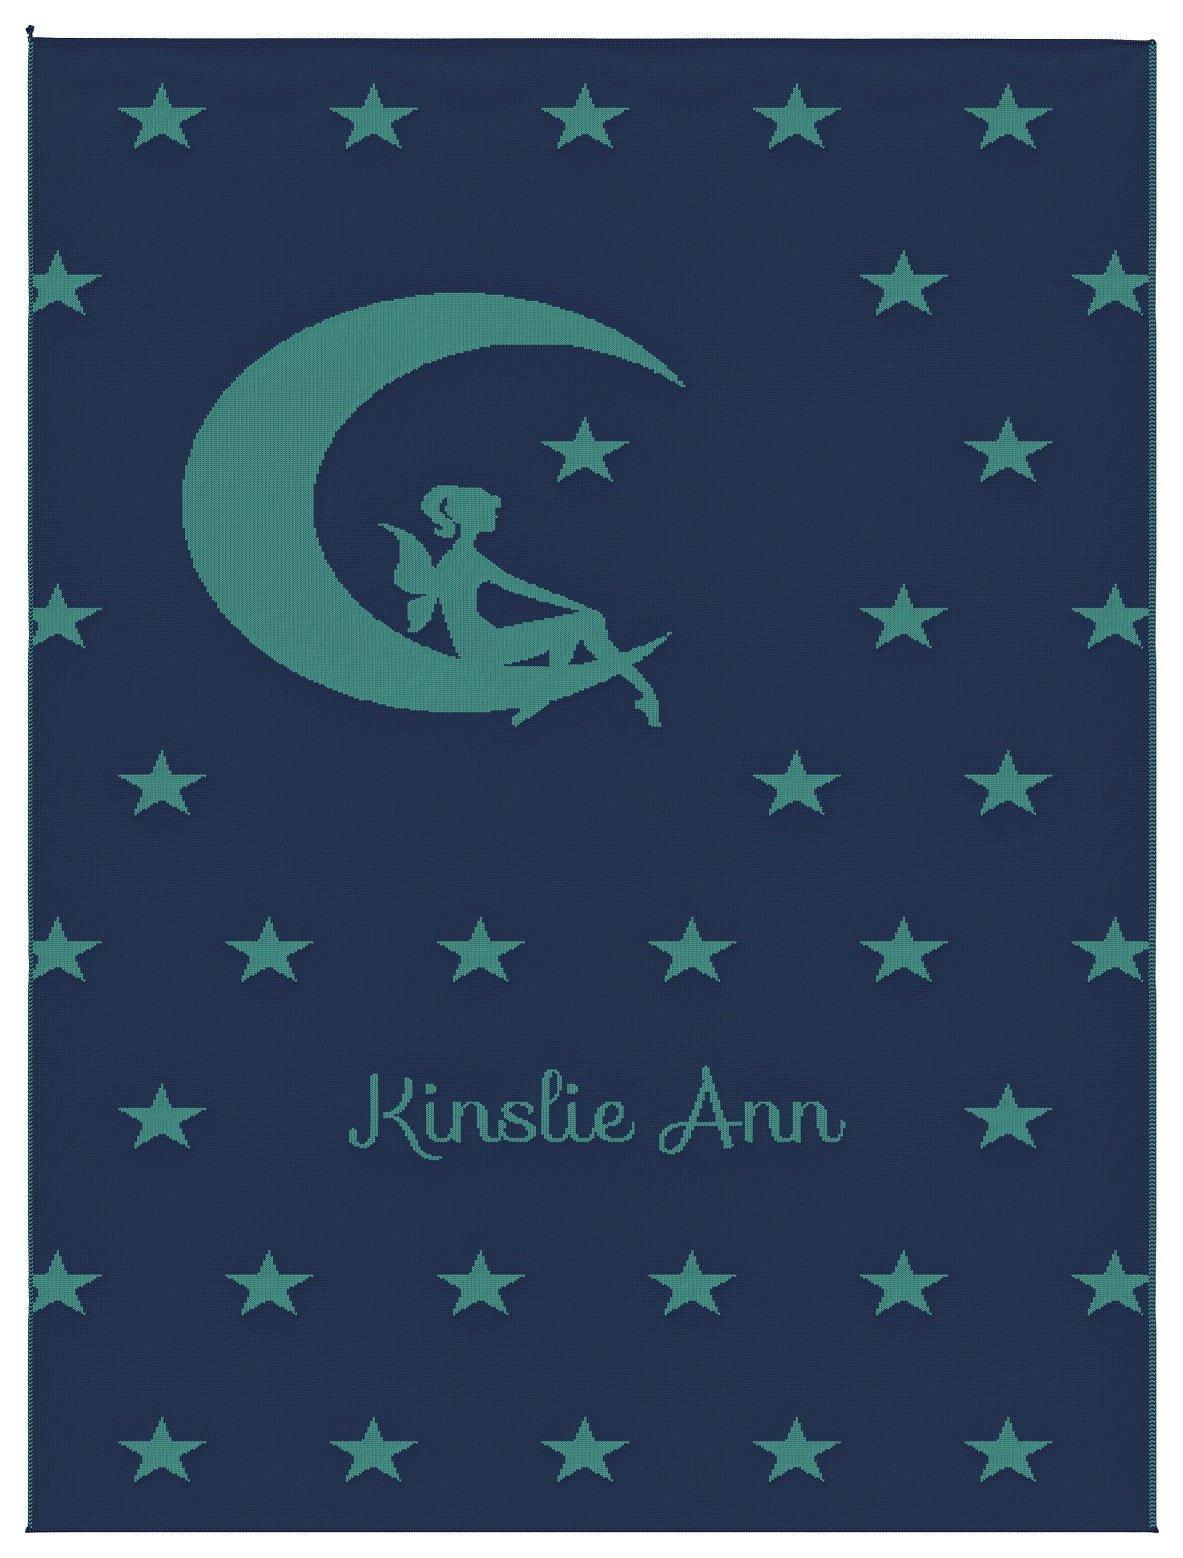 Emji Luxury Knit Baby Blanket with Fairy Stars, Customized Girl's Name Stroller Blanket, 100% Cashwool Merino Wool, Blue and Sea Green